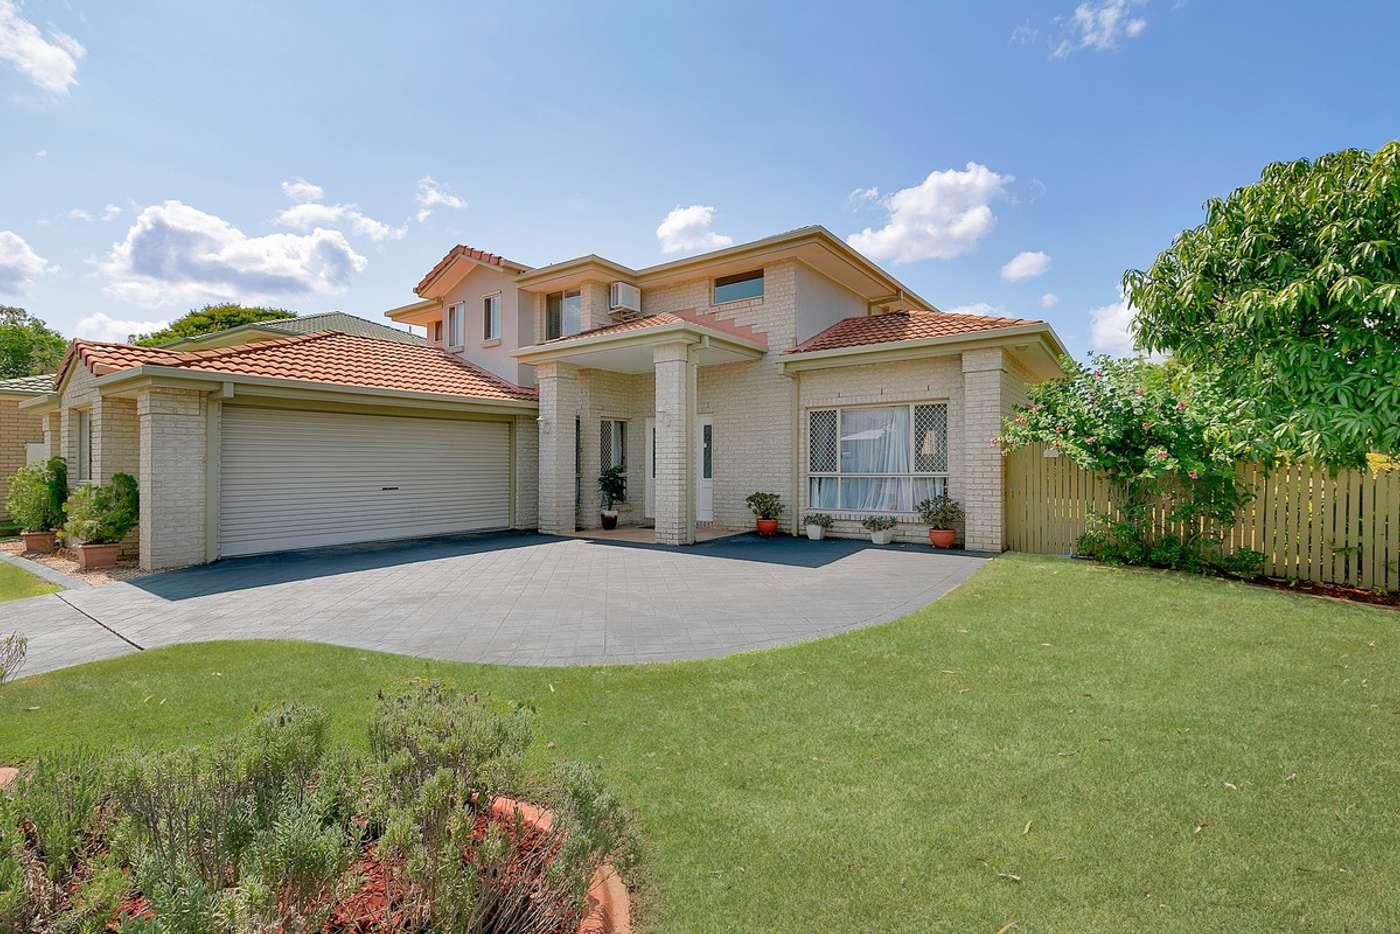 Main view of Homely house listing, 1 Kakadu Close, Riverhills QLD 4074